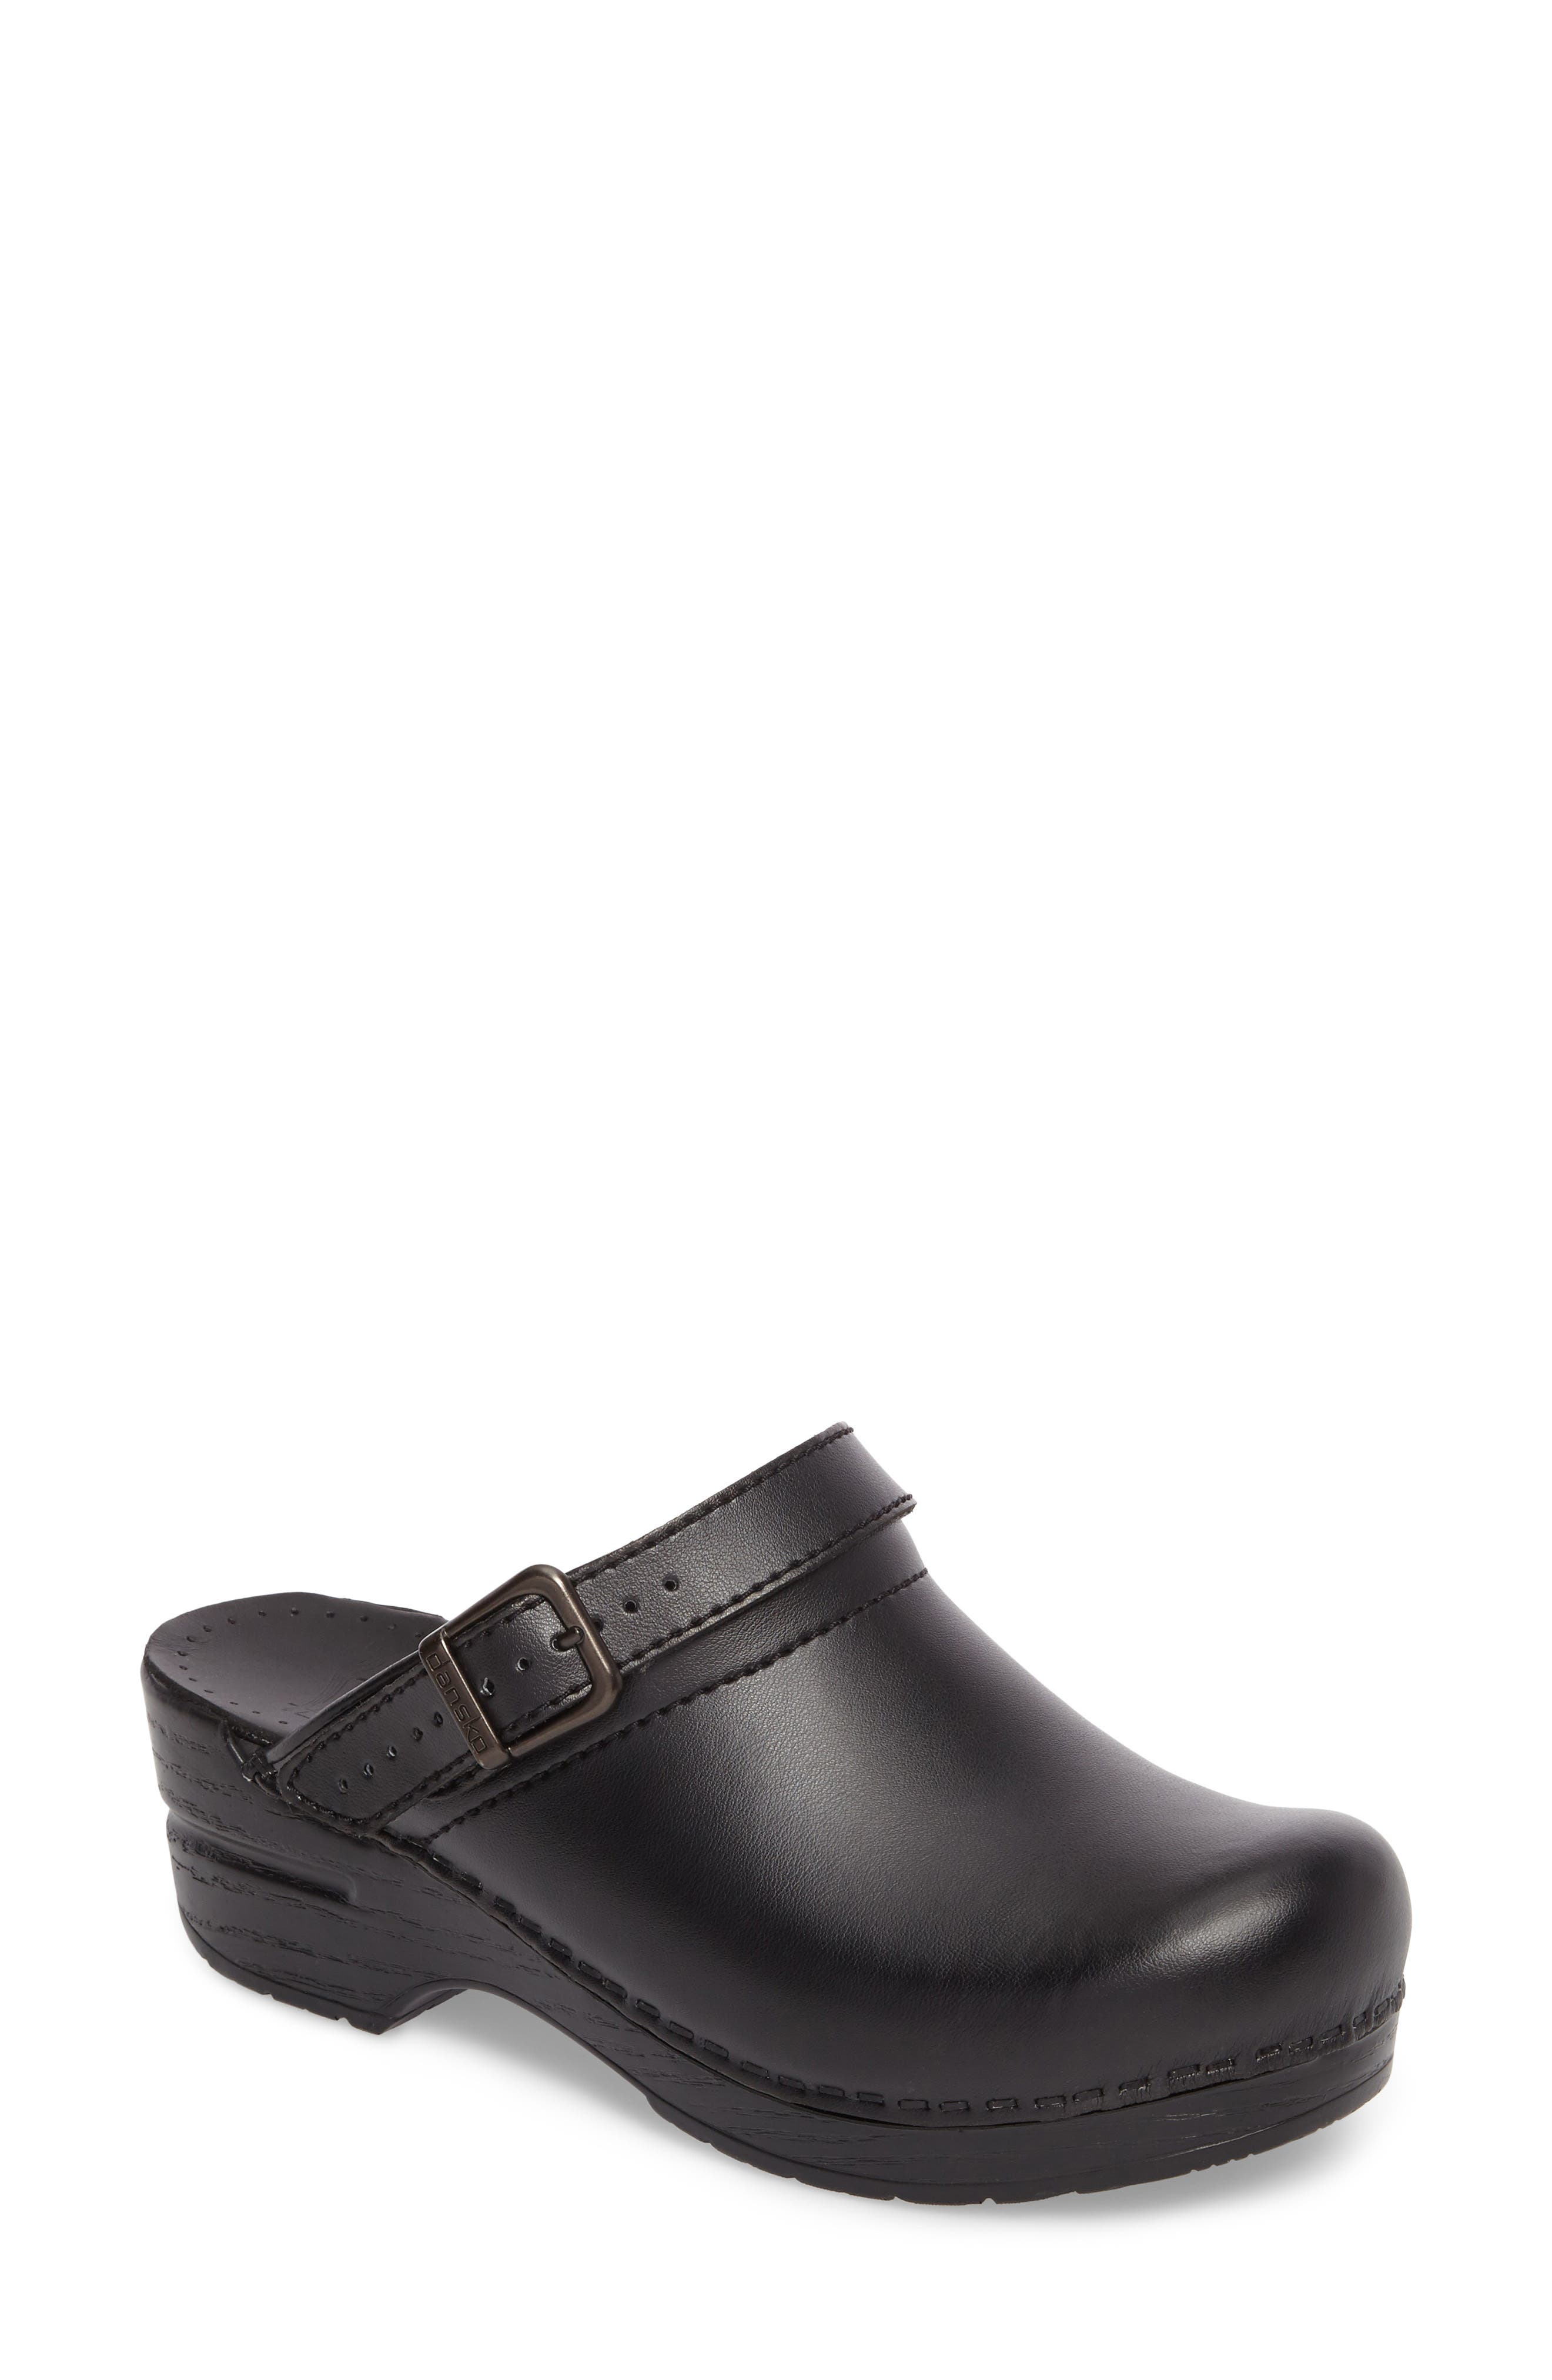 Dansko Womens Shoes Nordstrom